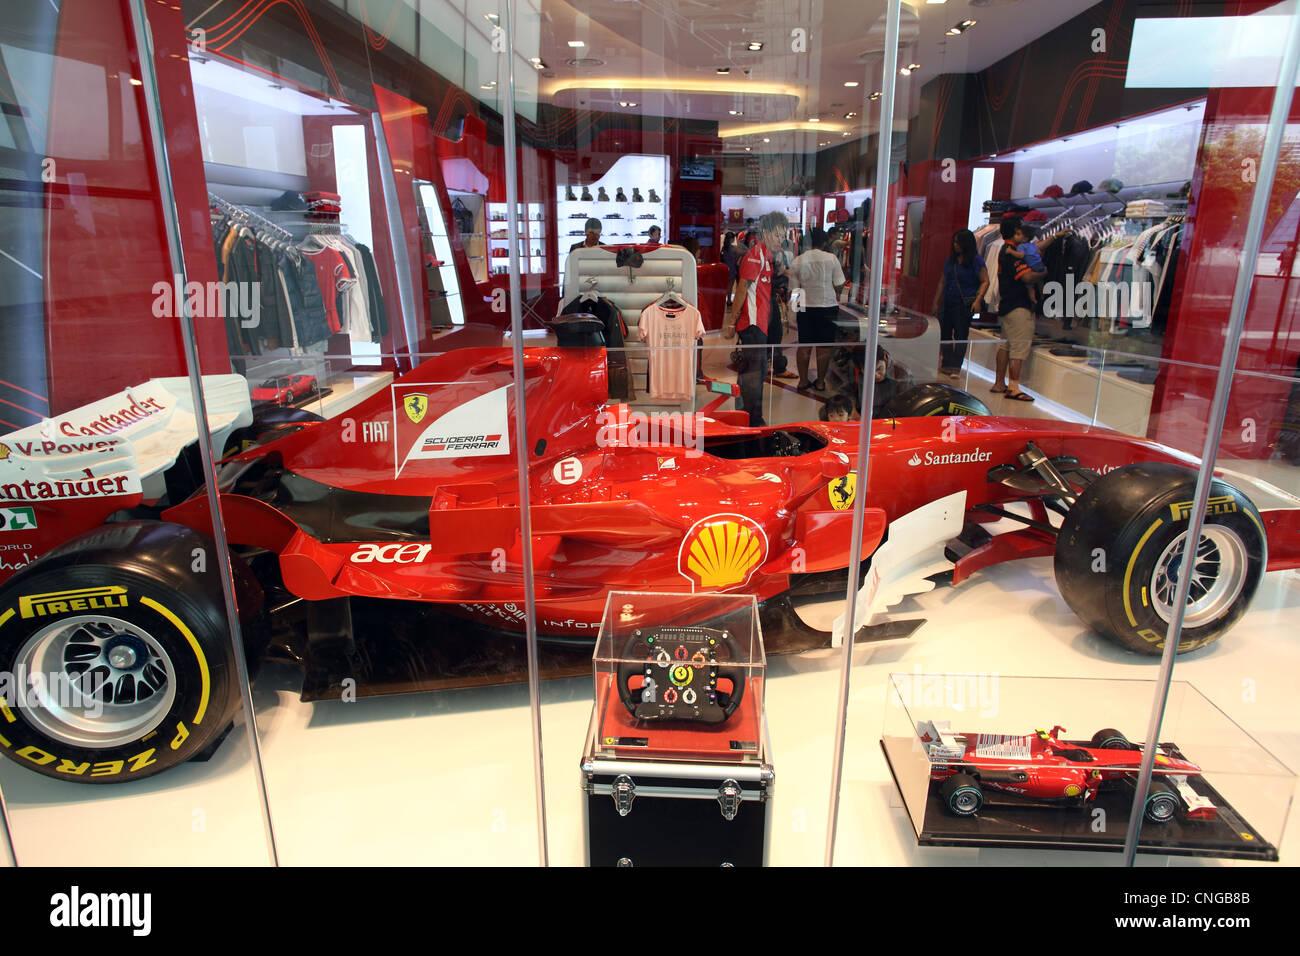 bebe05a497c Ferrari formula one racing car inside Ferrari shop at the Marina Bay Sands